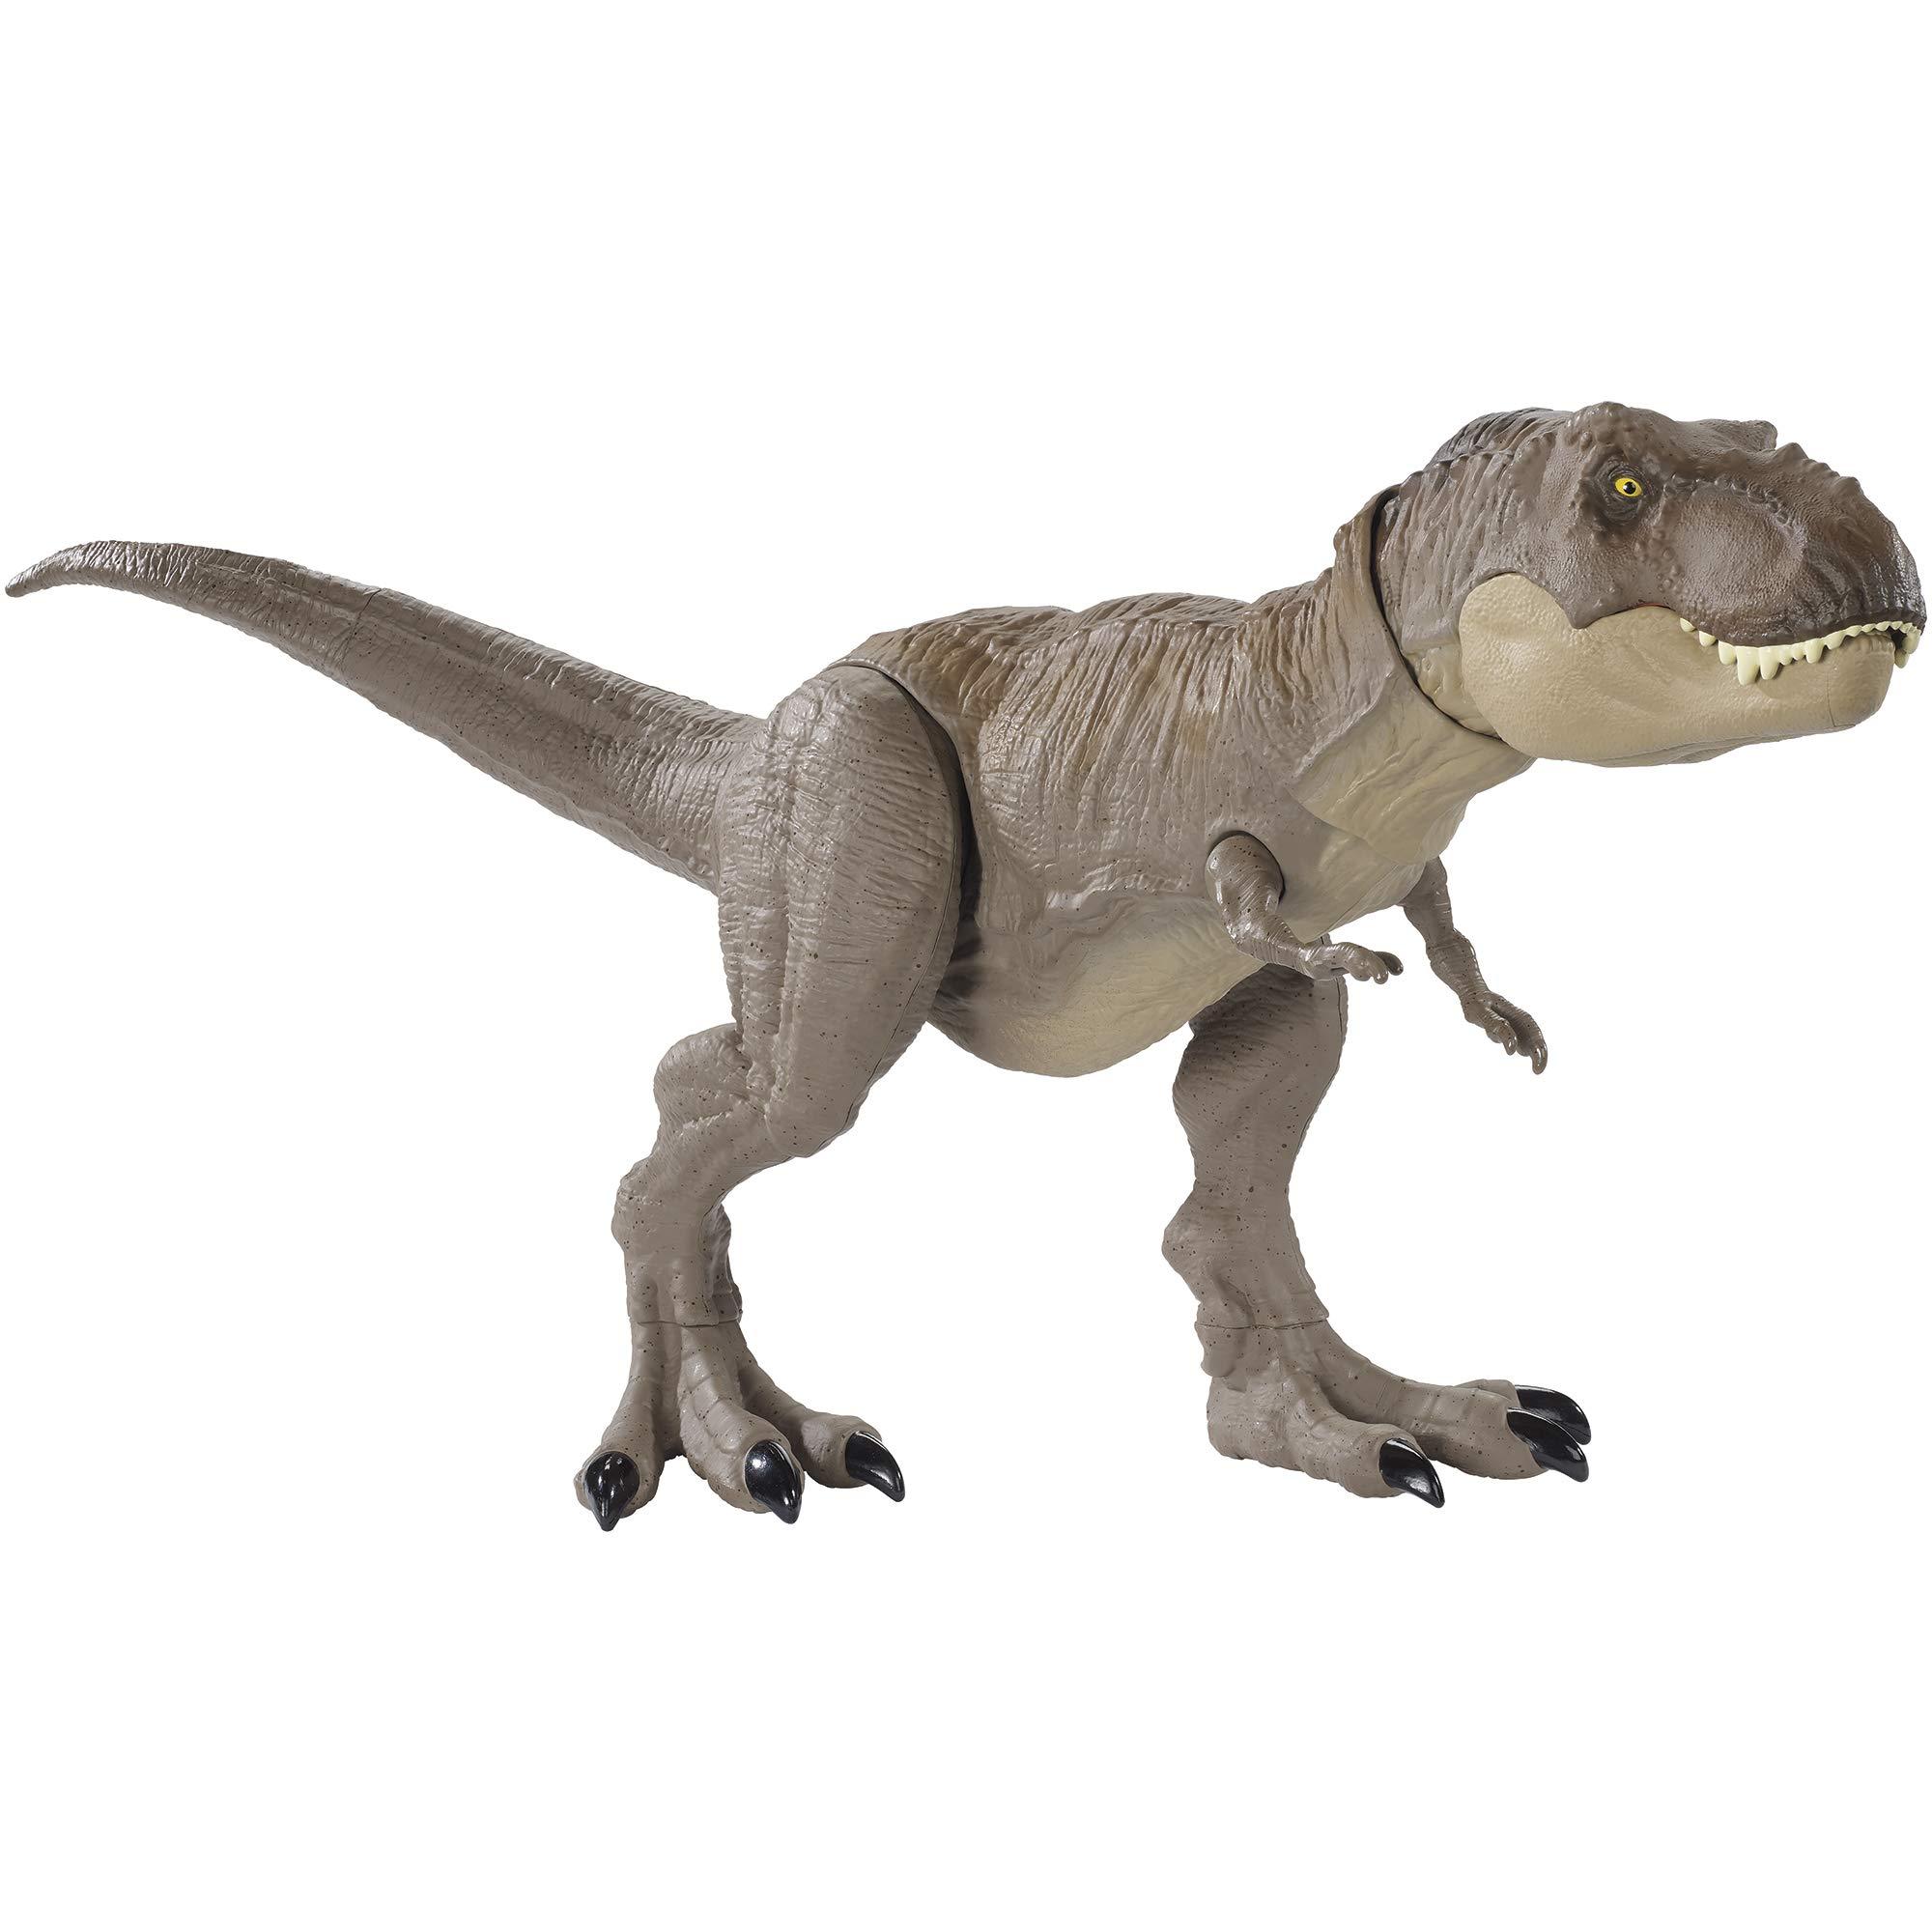 Jurassic World Legacy Collection Extreme Chompin' Tyrannosaurus Rex